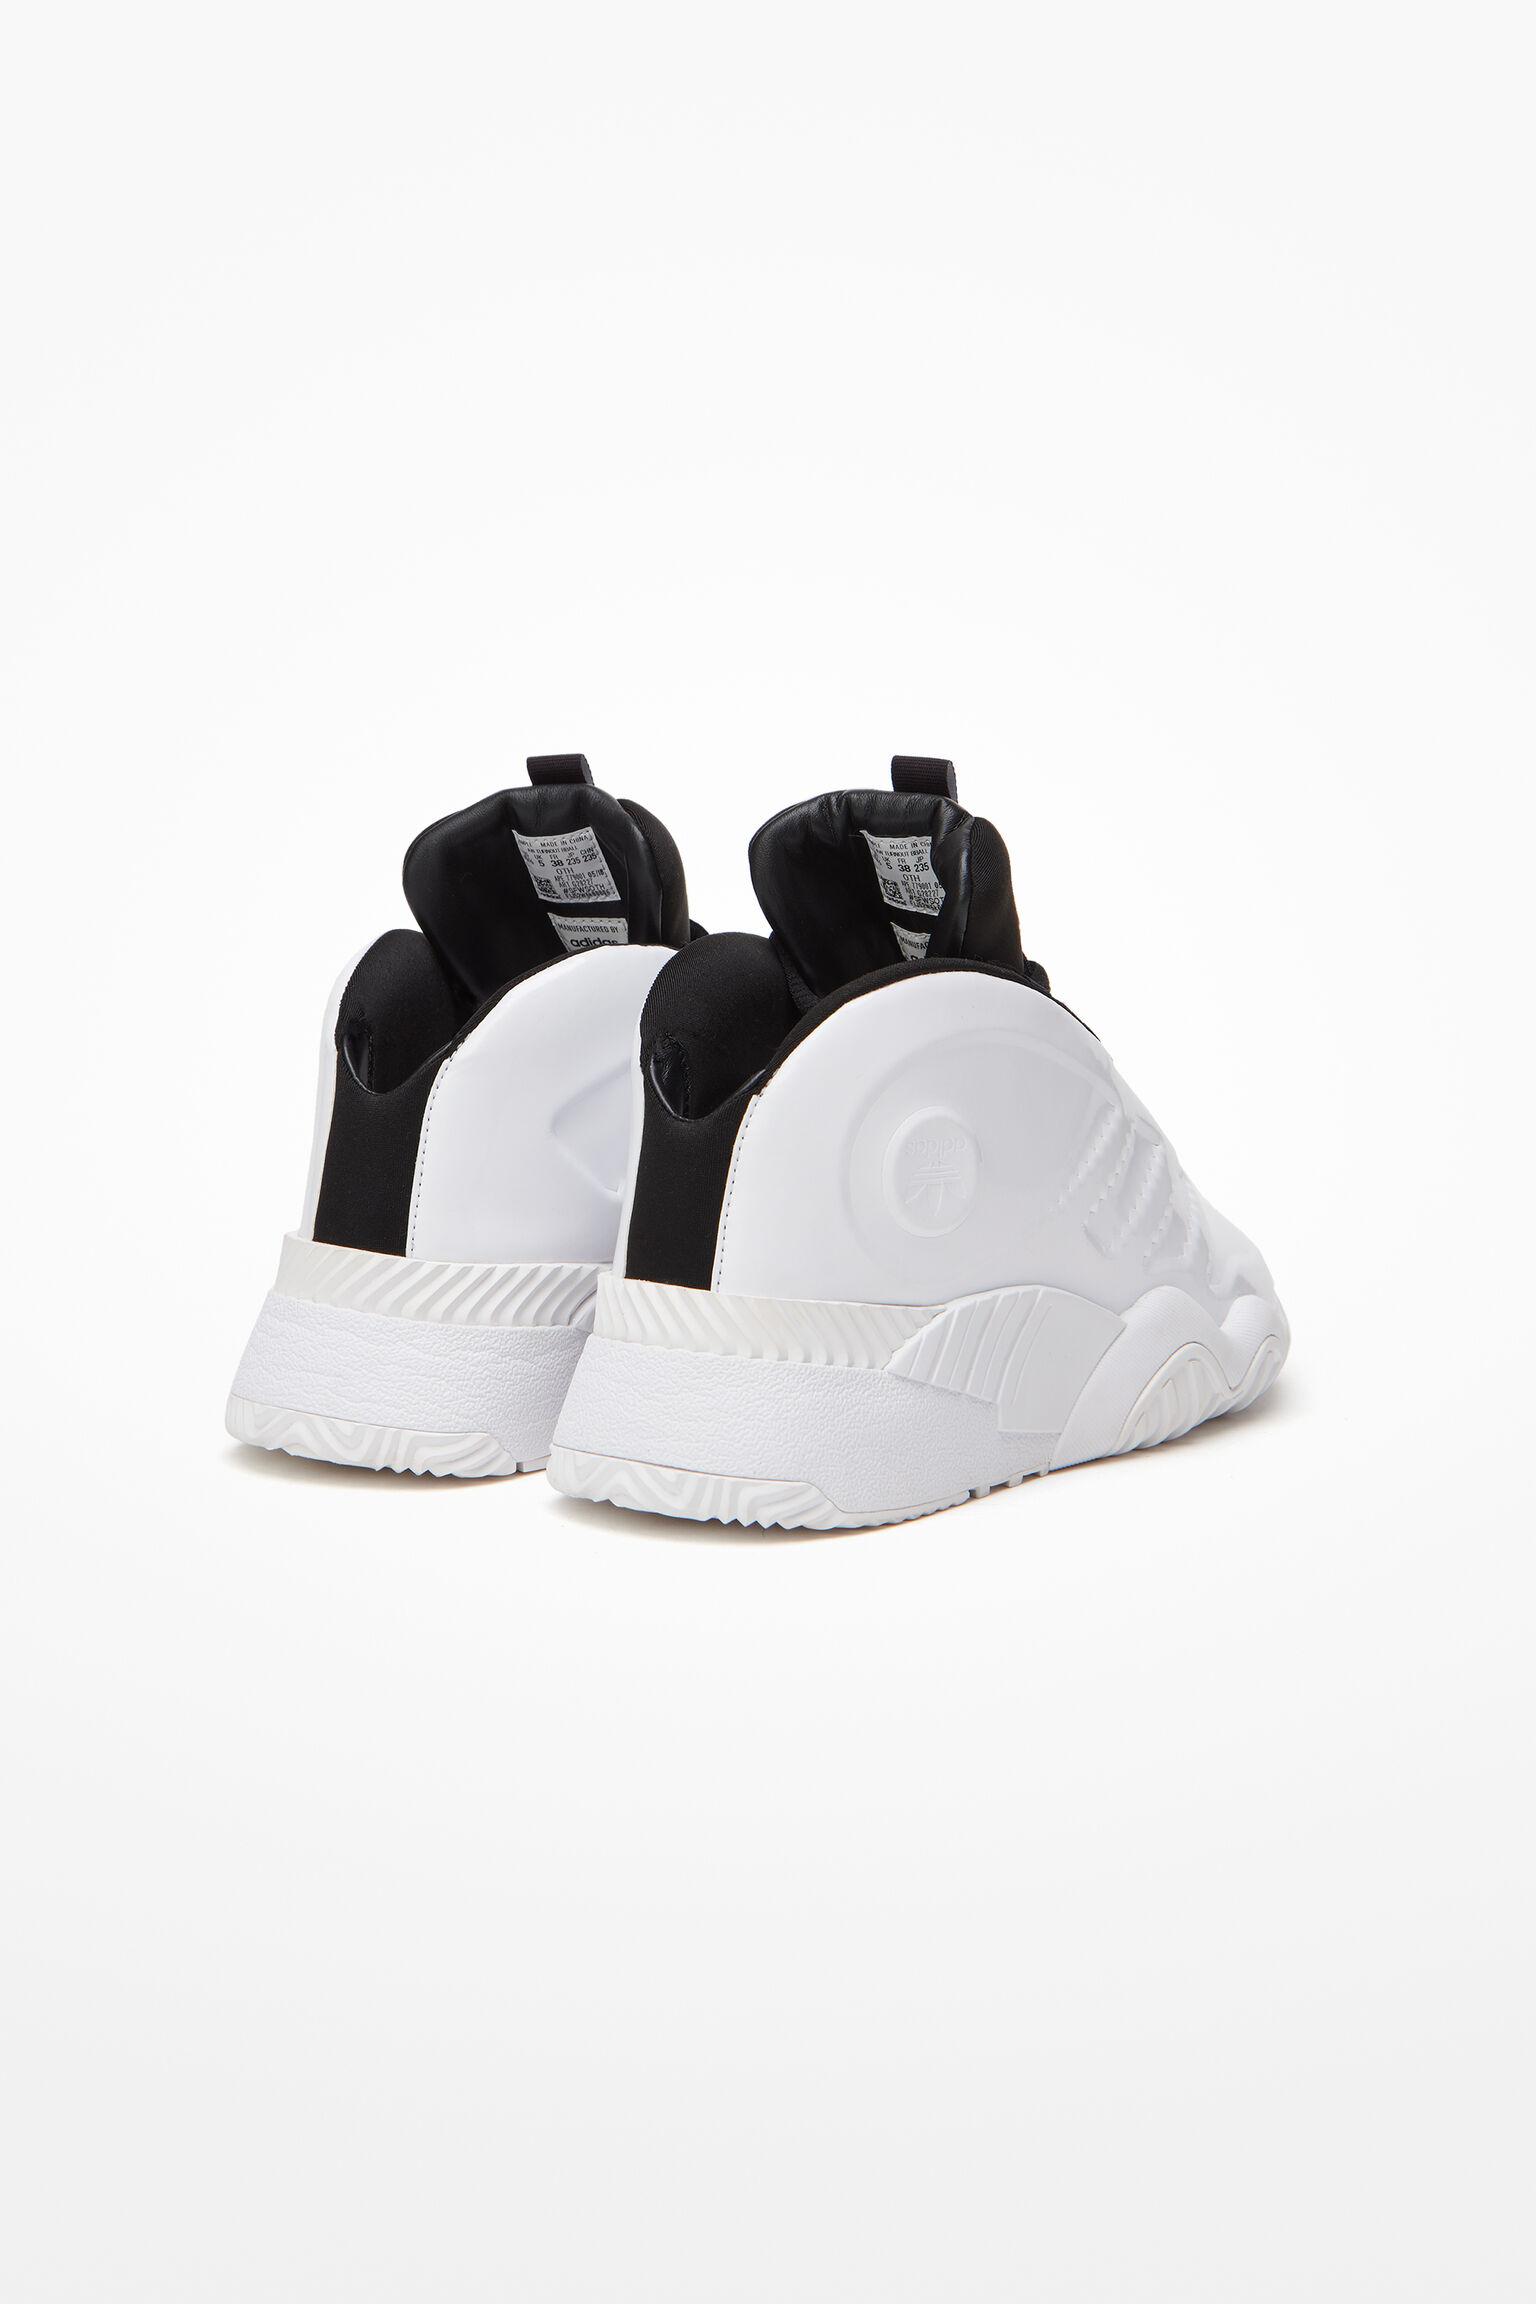 6ff9593ab6 alexanderwang adidas x aw futureshell - Alexander Wang